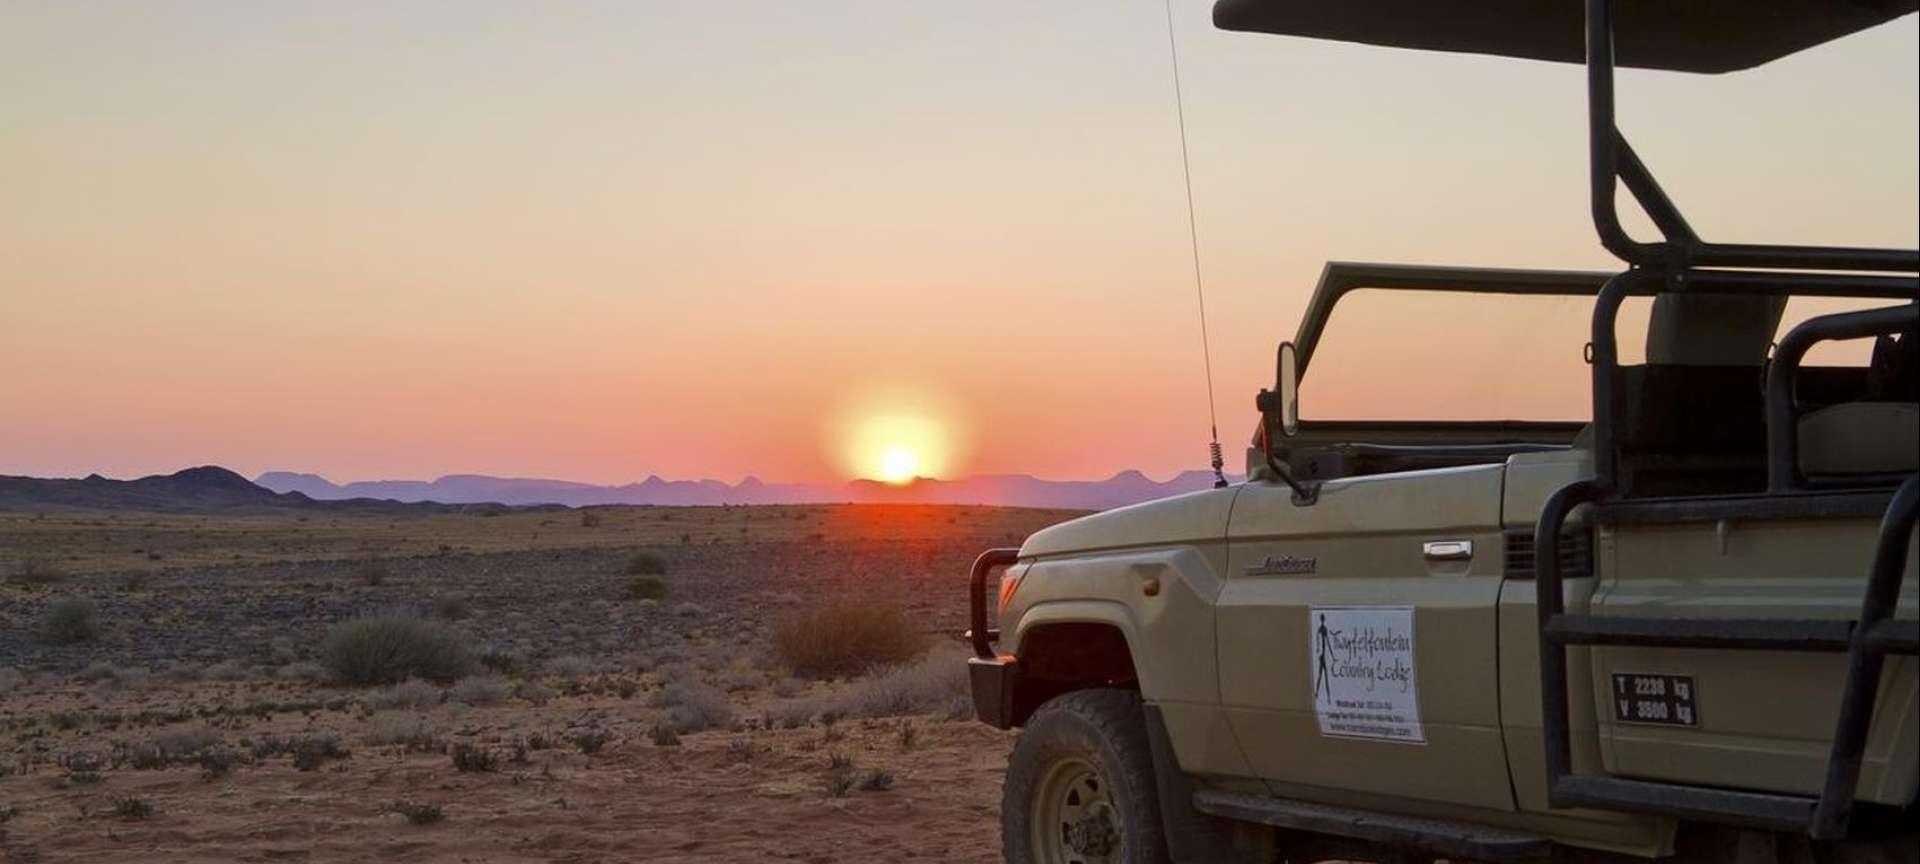 Twyfelfontein - Africa Wildlife Safaris